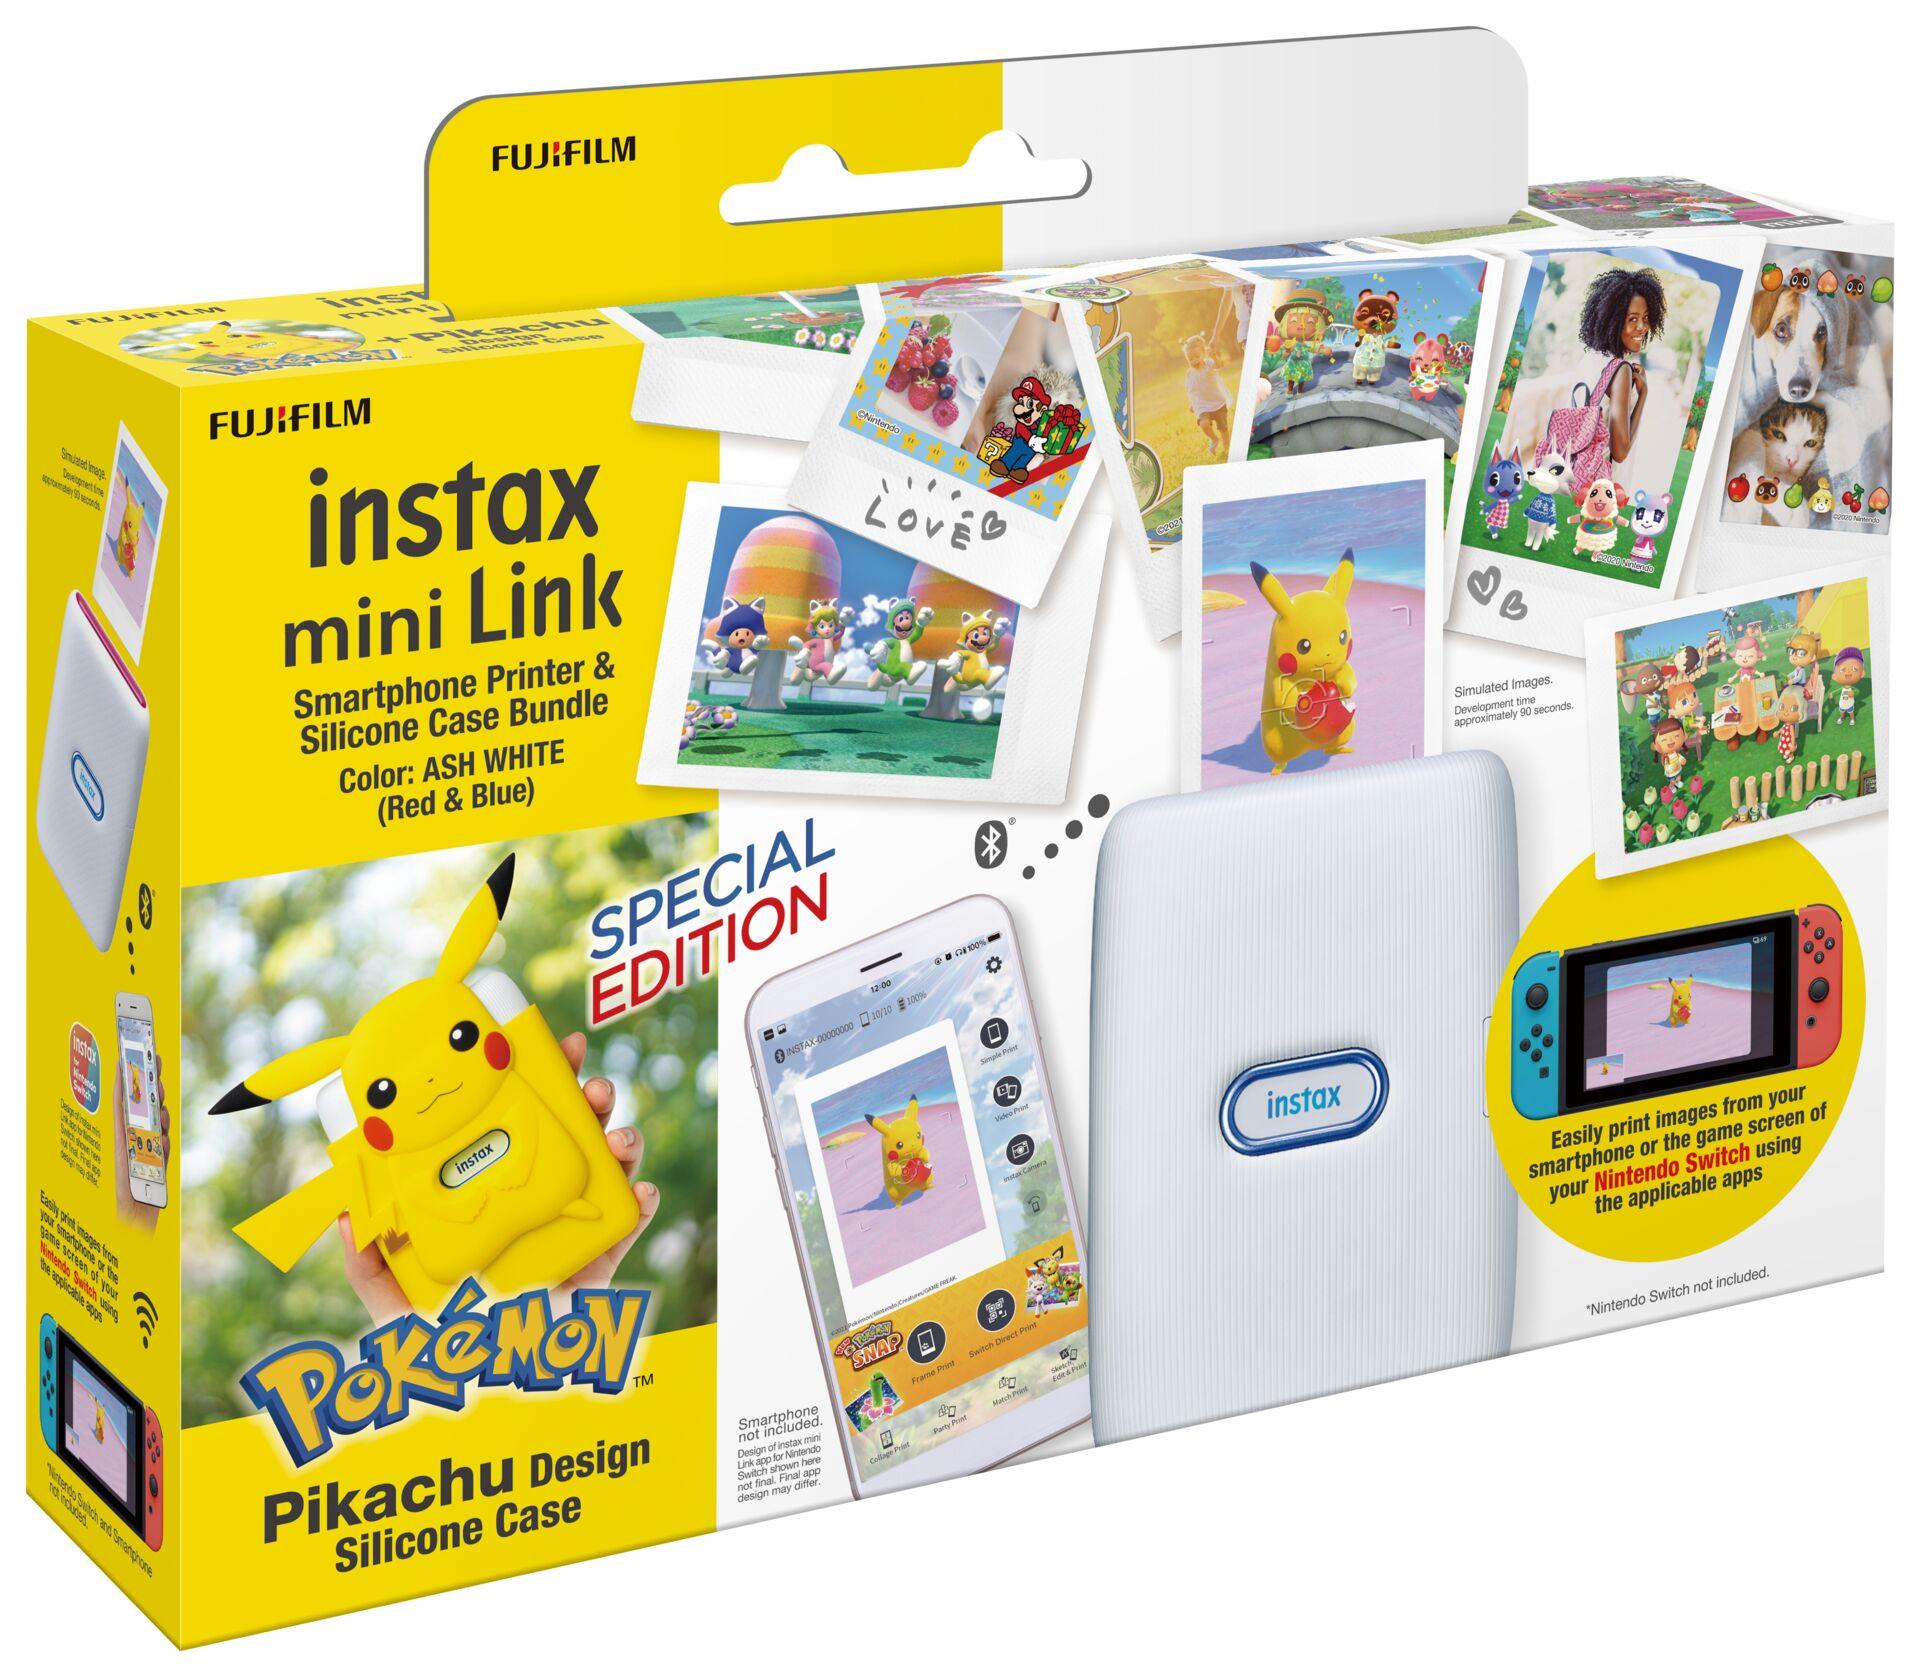 mini link SE Nintendo case package